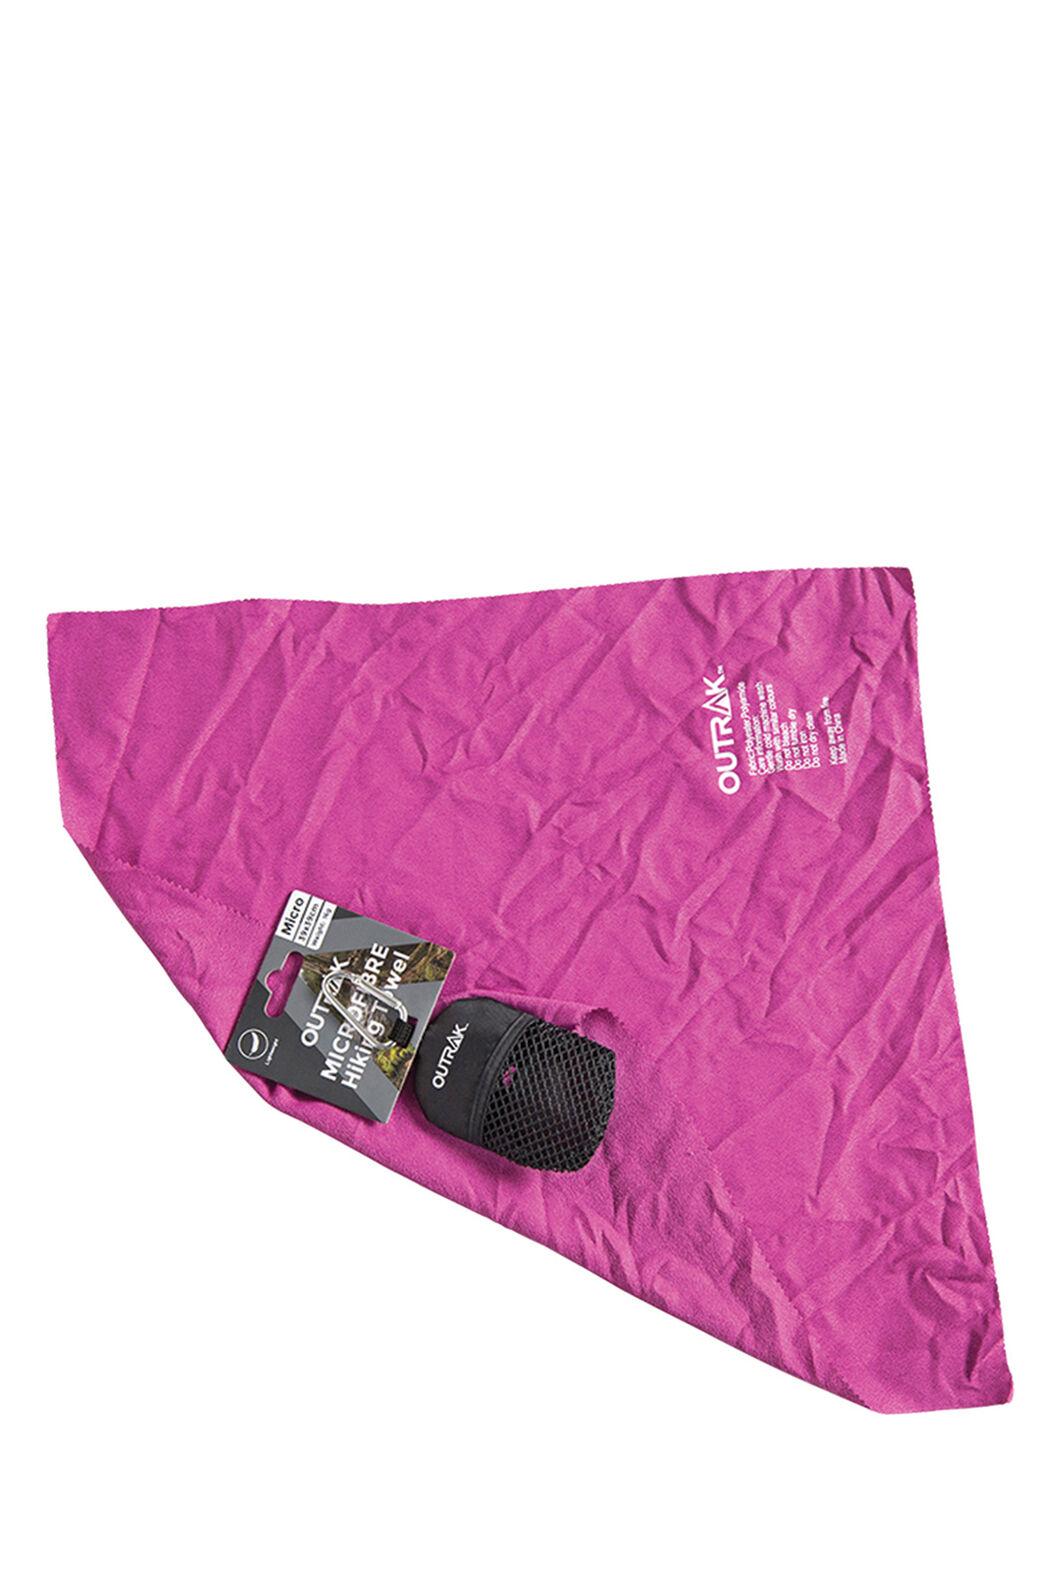 Outrak Hiking Micro Towel, Purple, hi-res